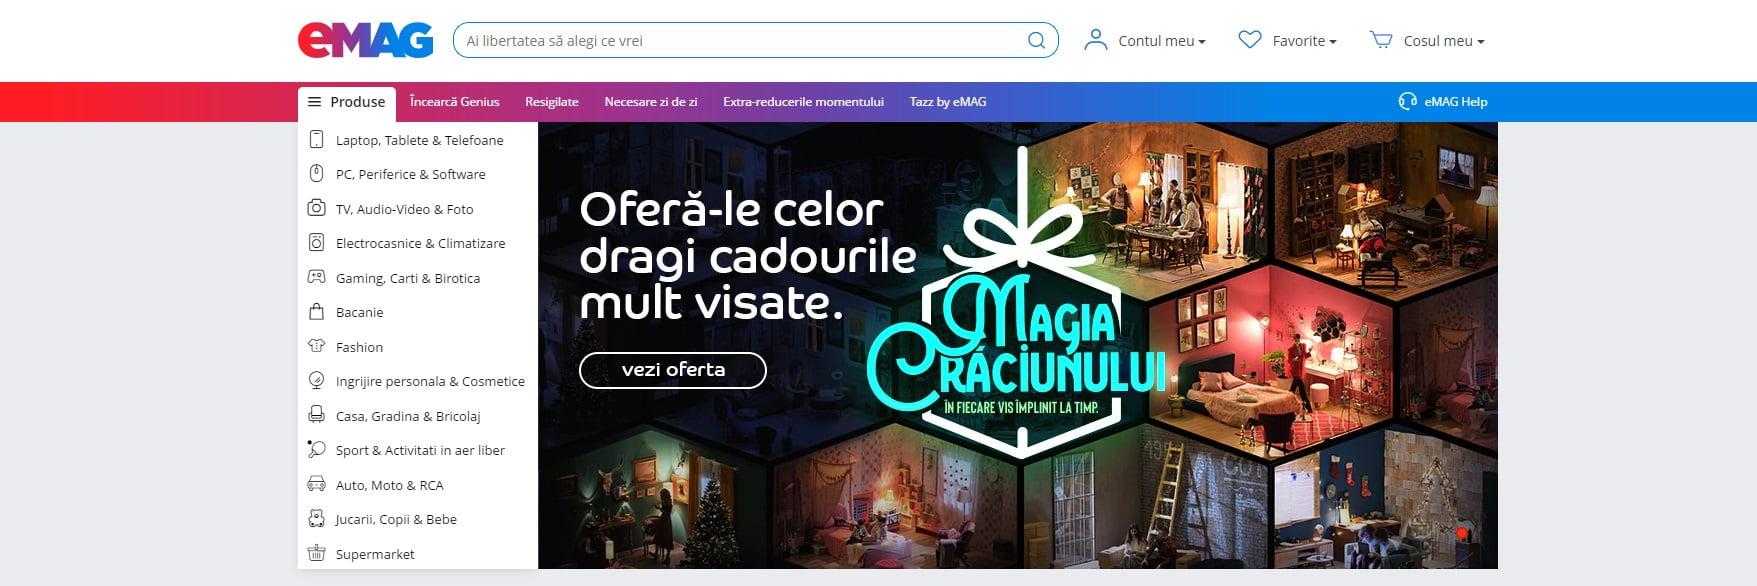 campanie de Craciun eCommerce business